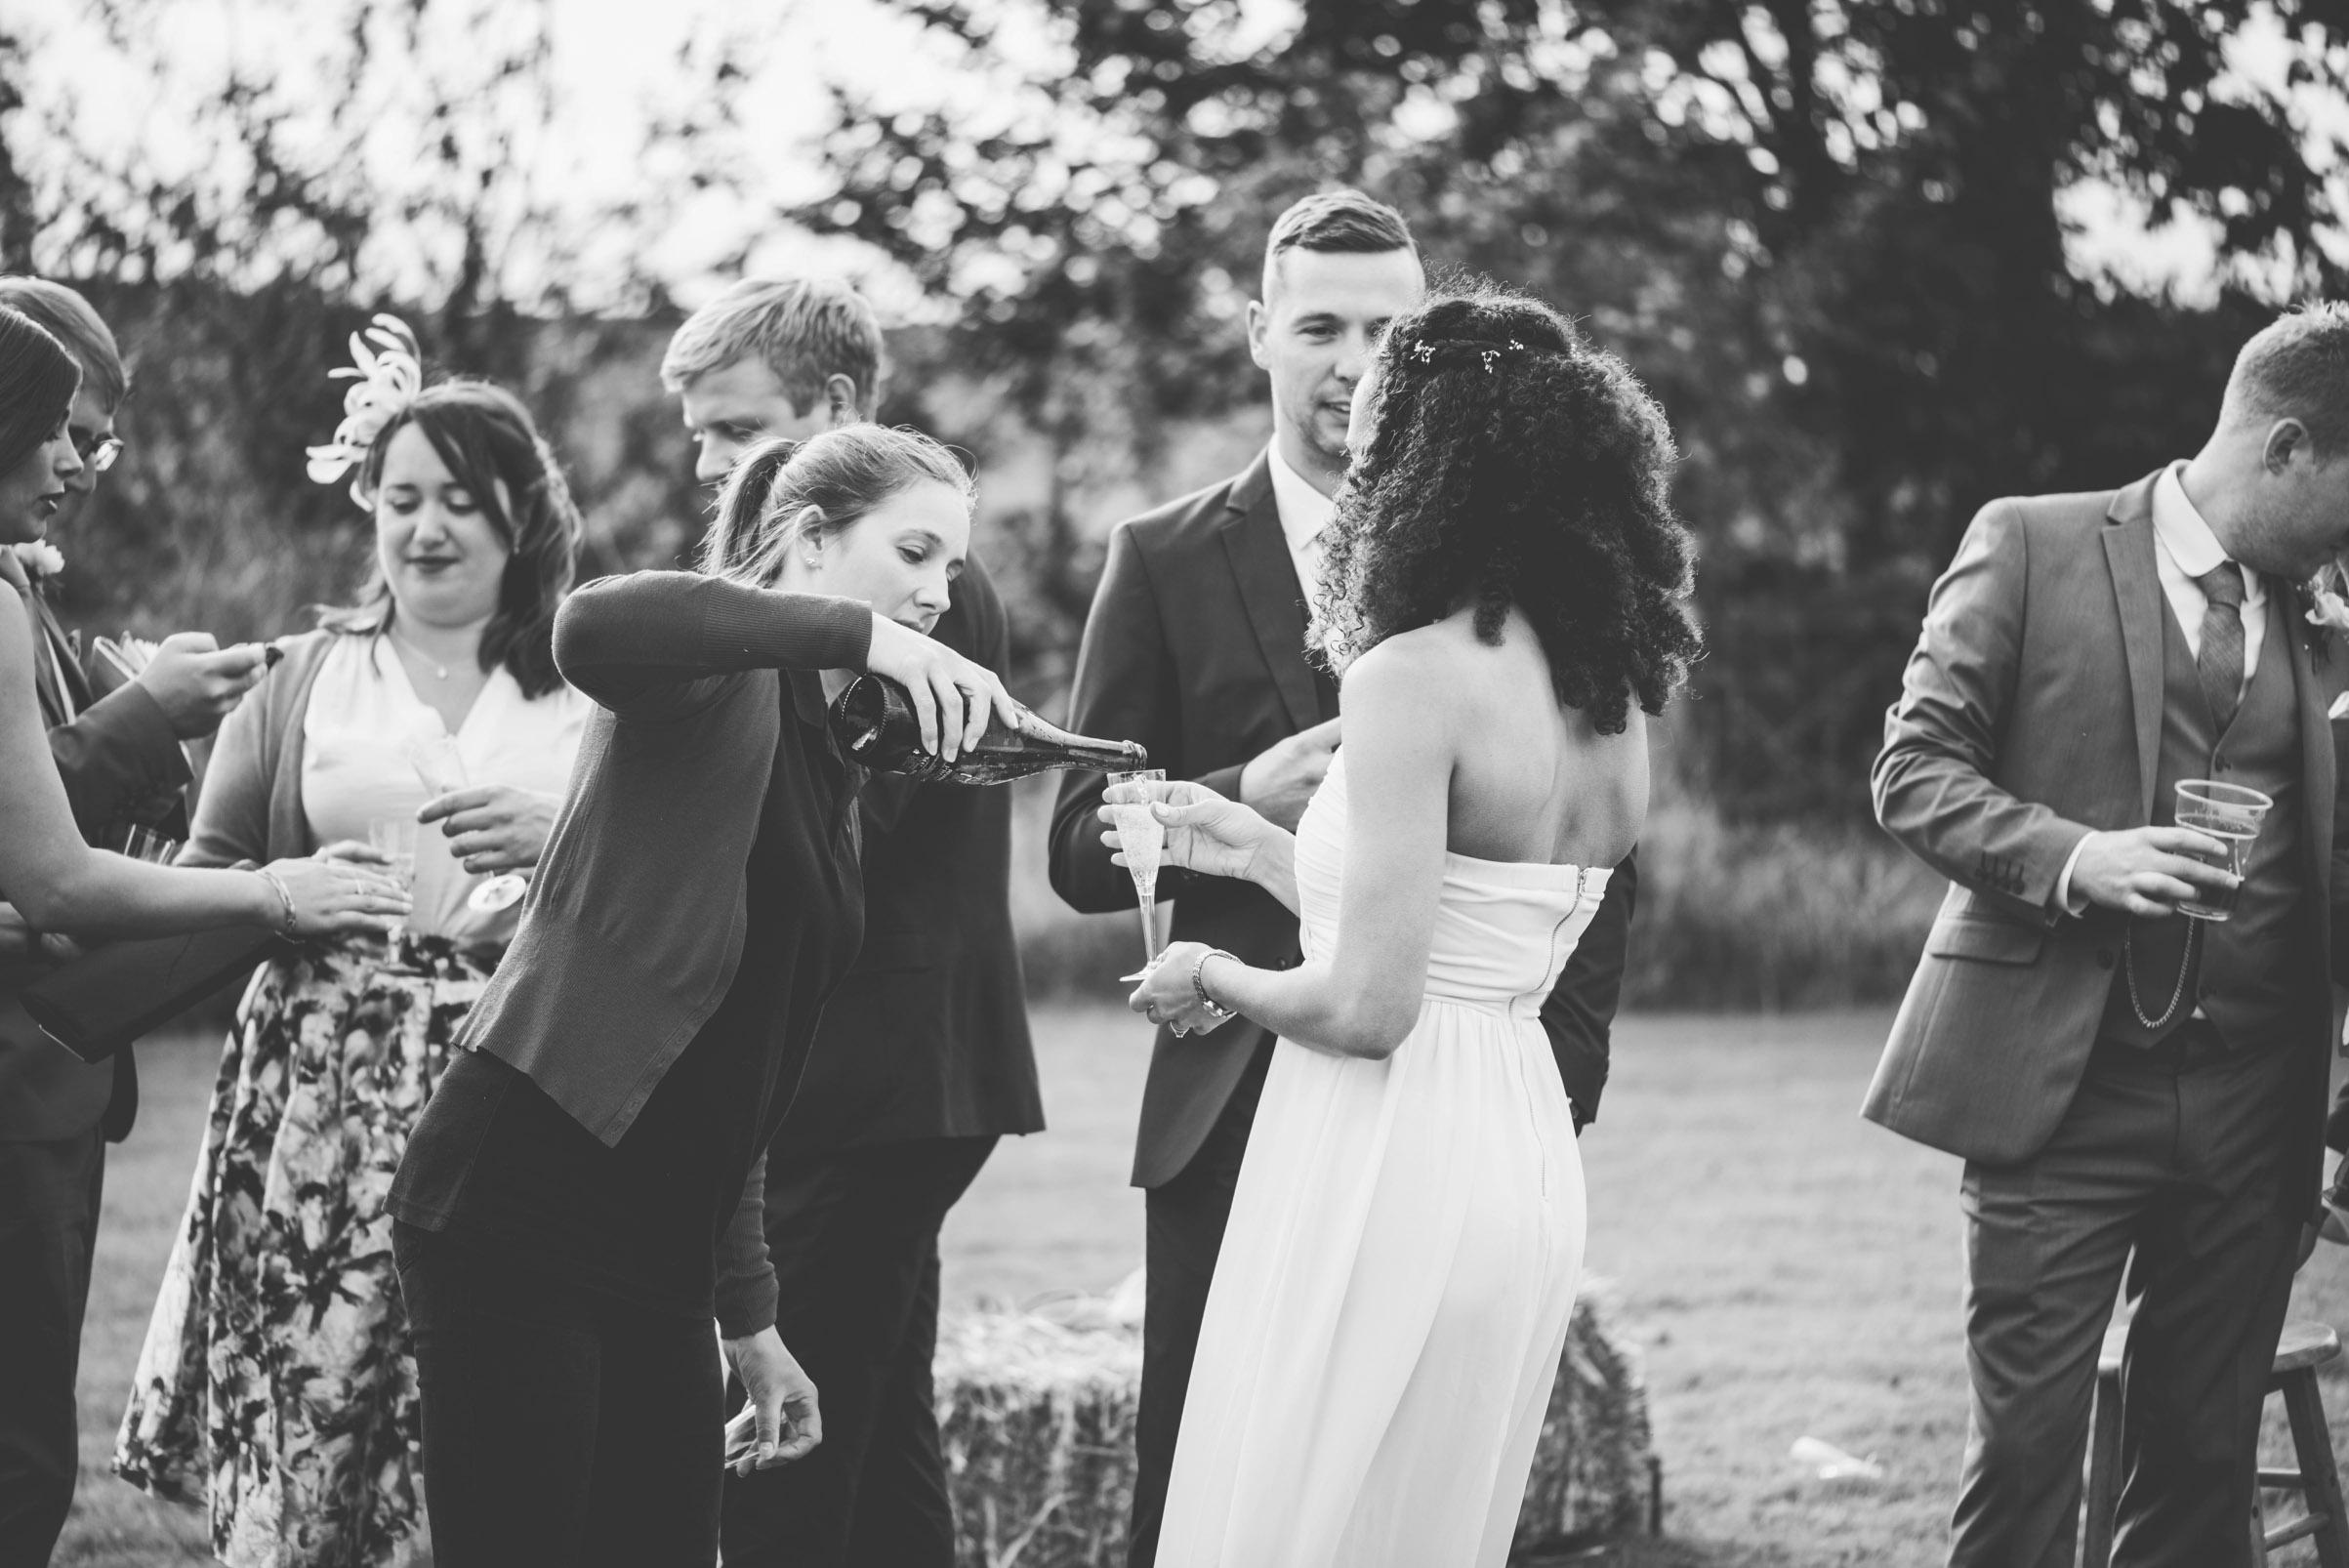 Peak+district+farm+wedding+lower+damgate+photographer-168.jpg